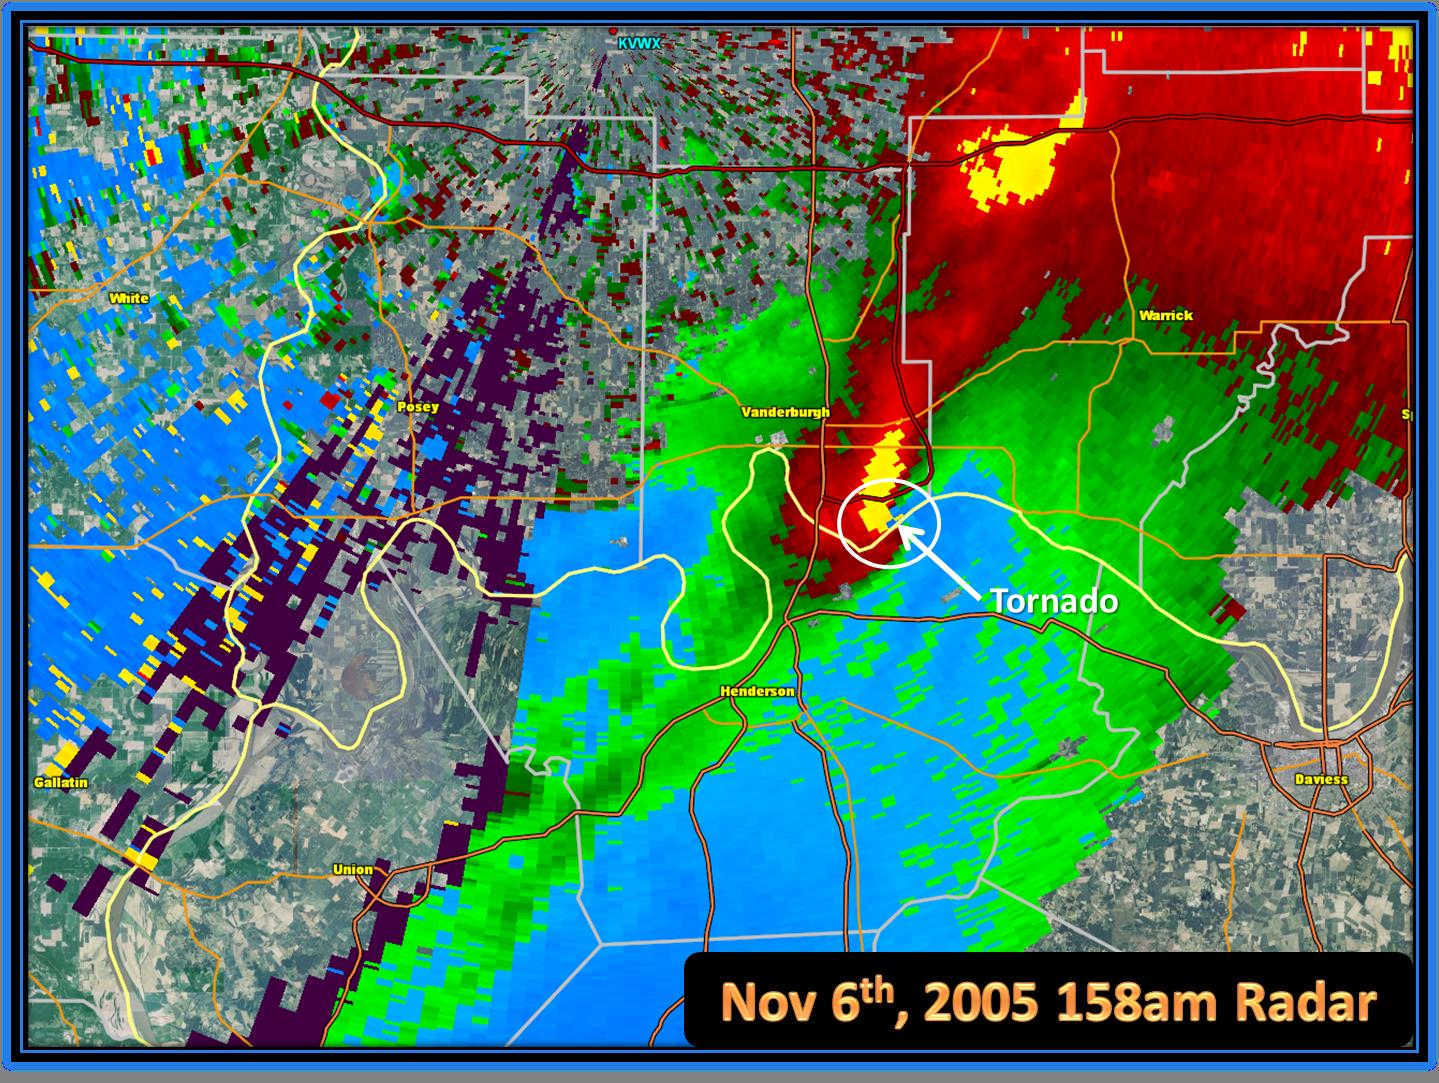 Nov Th  Evansville Area Tornado - National weather map and radar